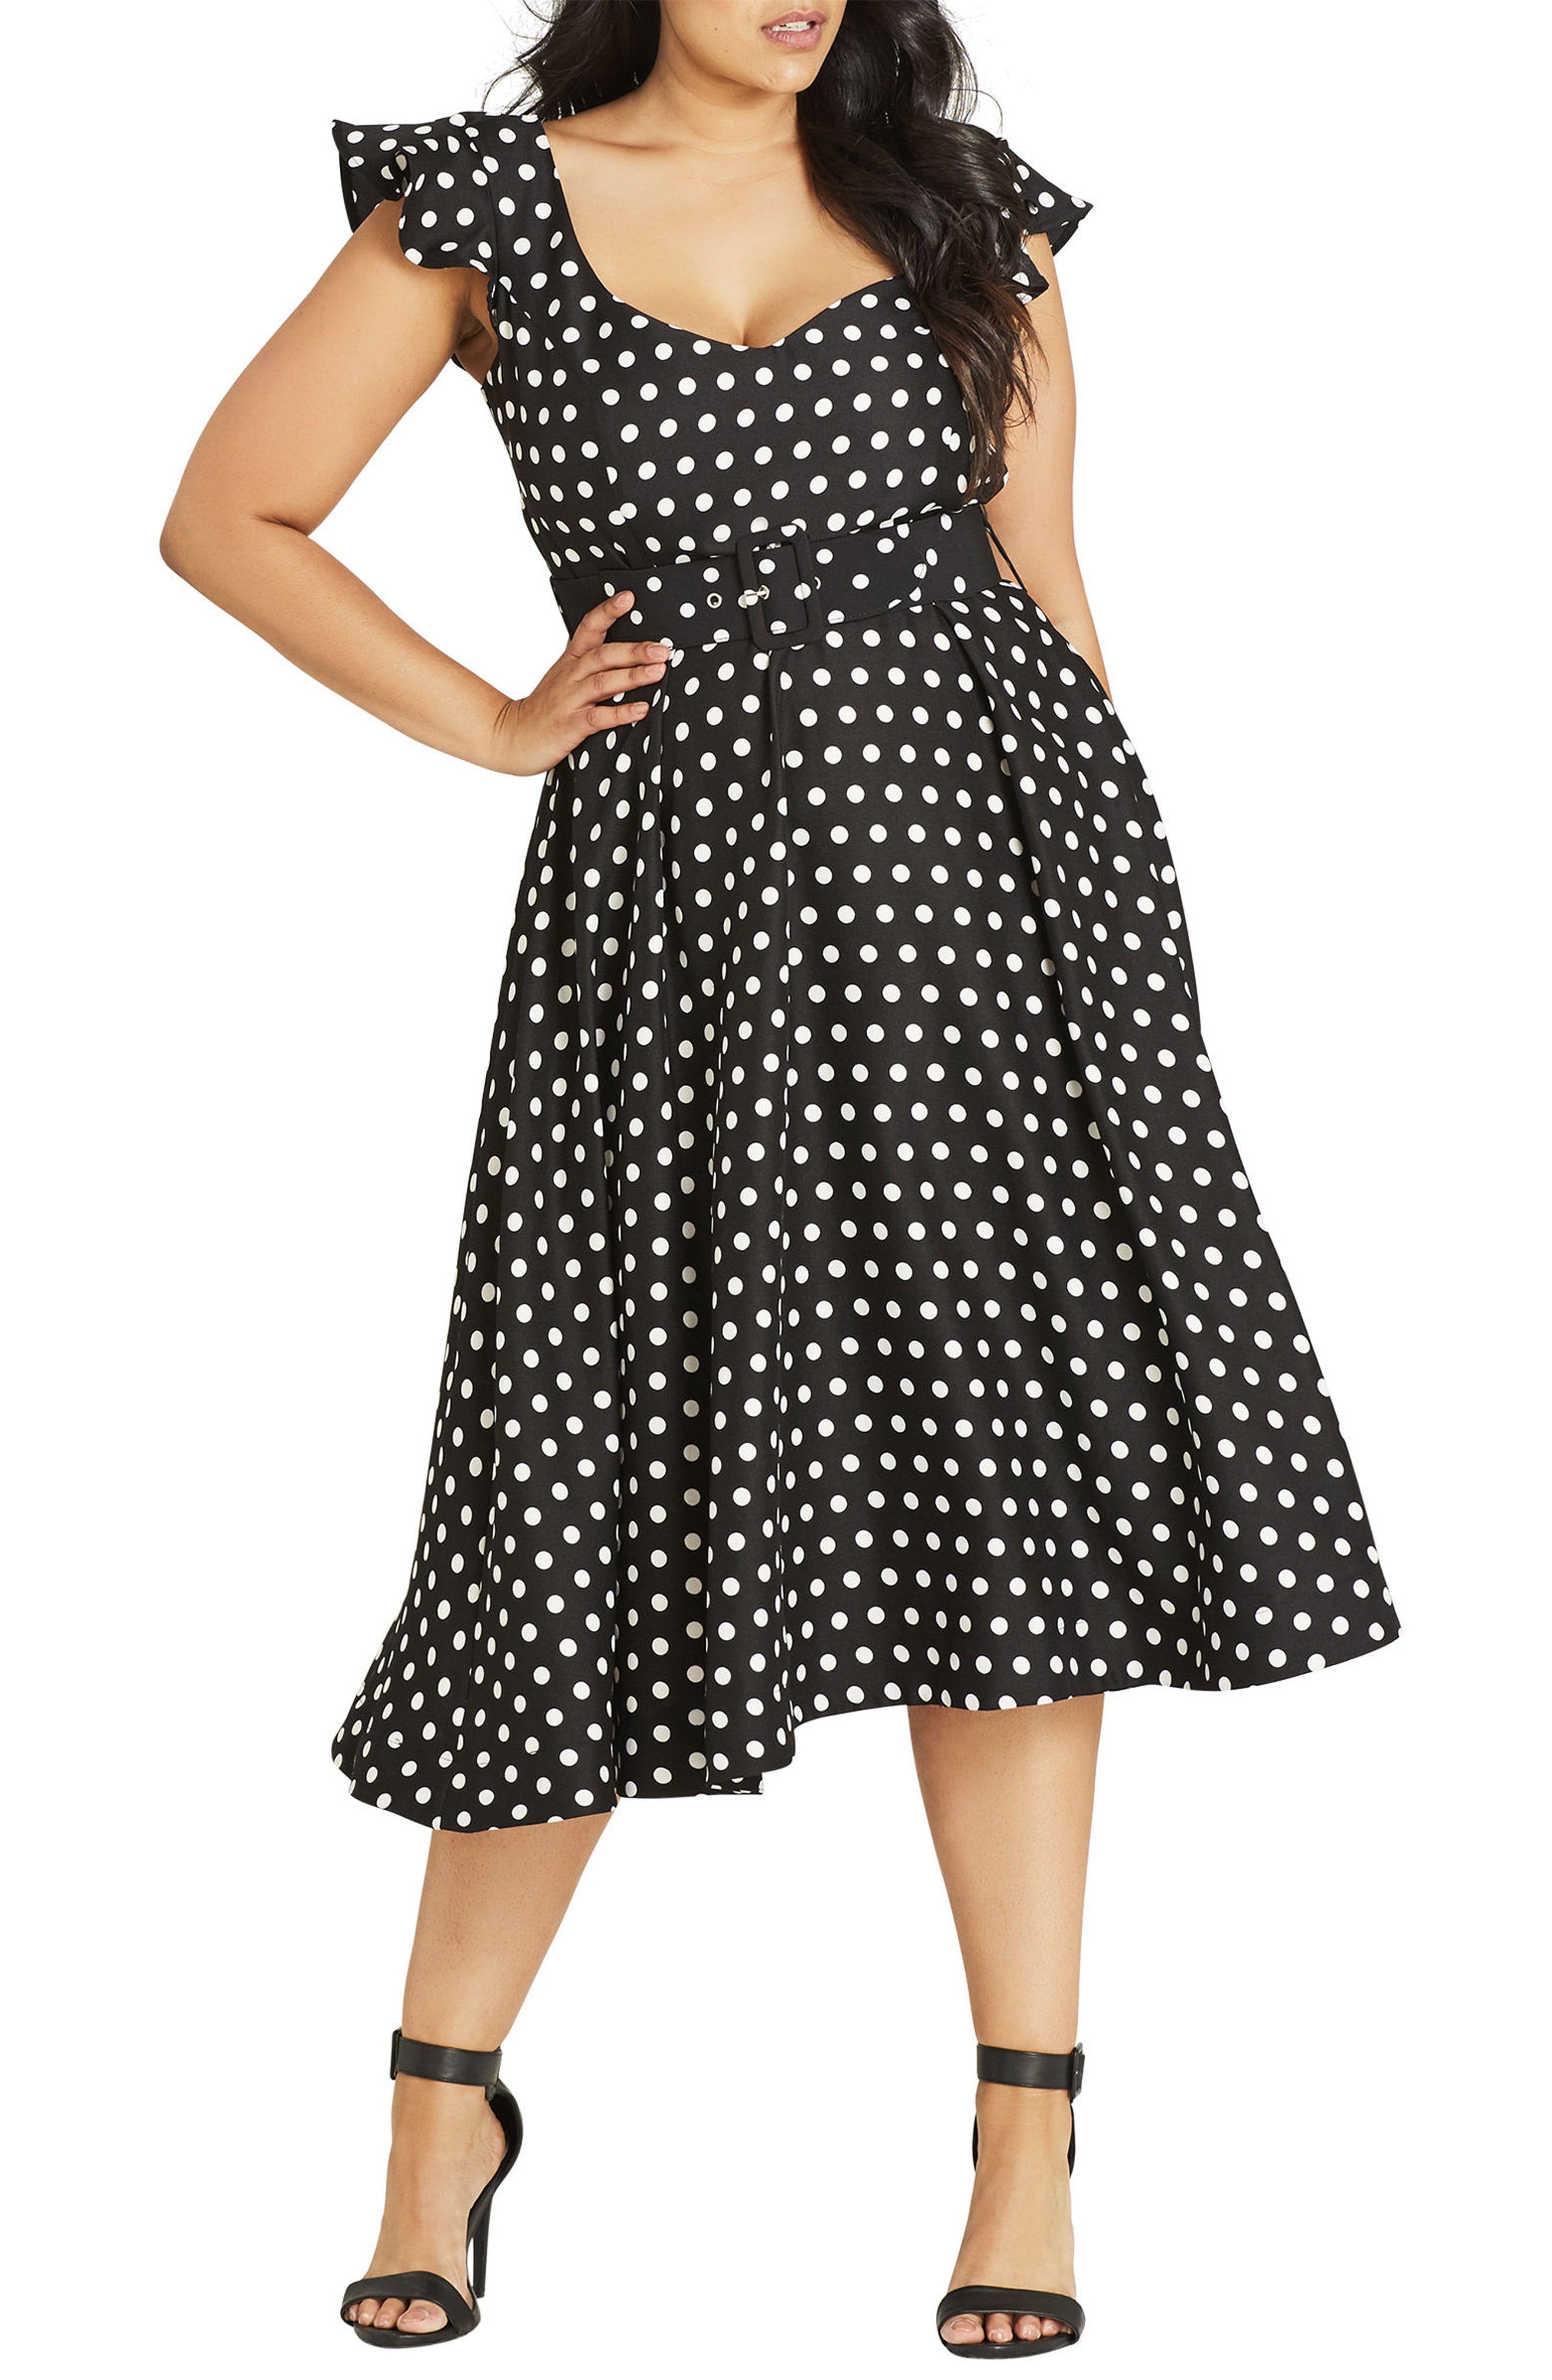 Vintage Polka Dot Dresses - 50s Spotty and Ditsy Prints ...